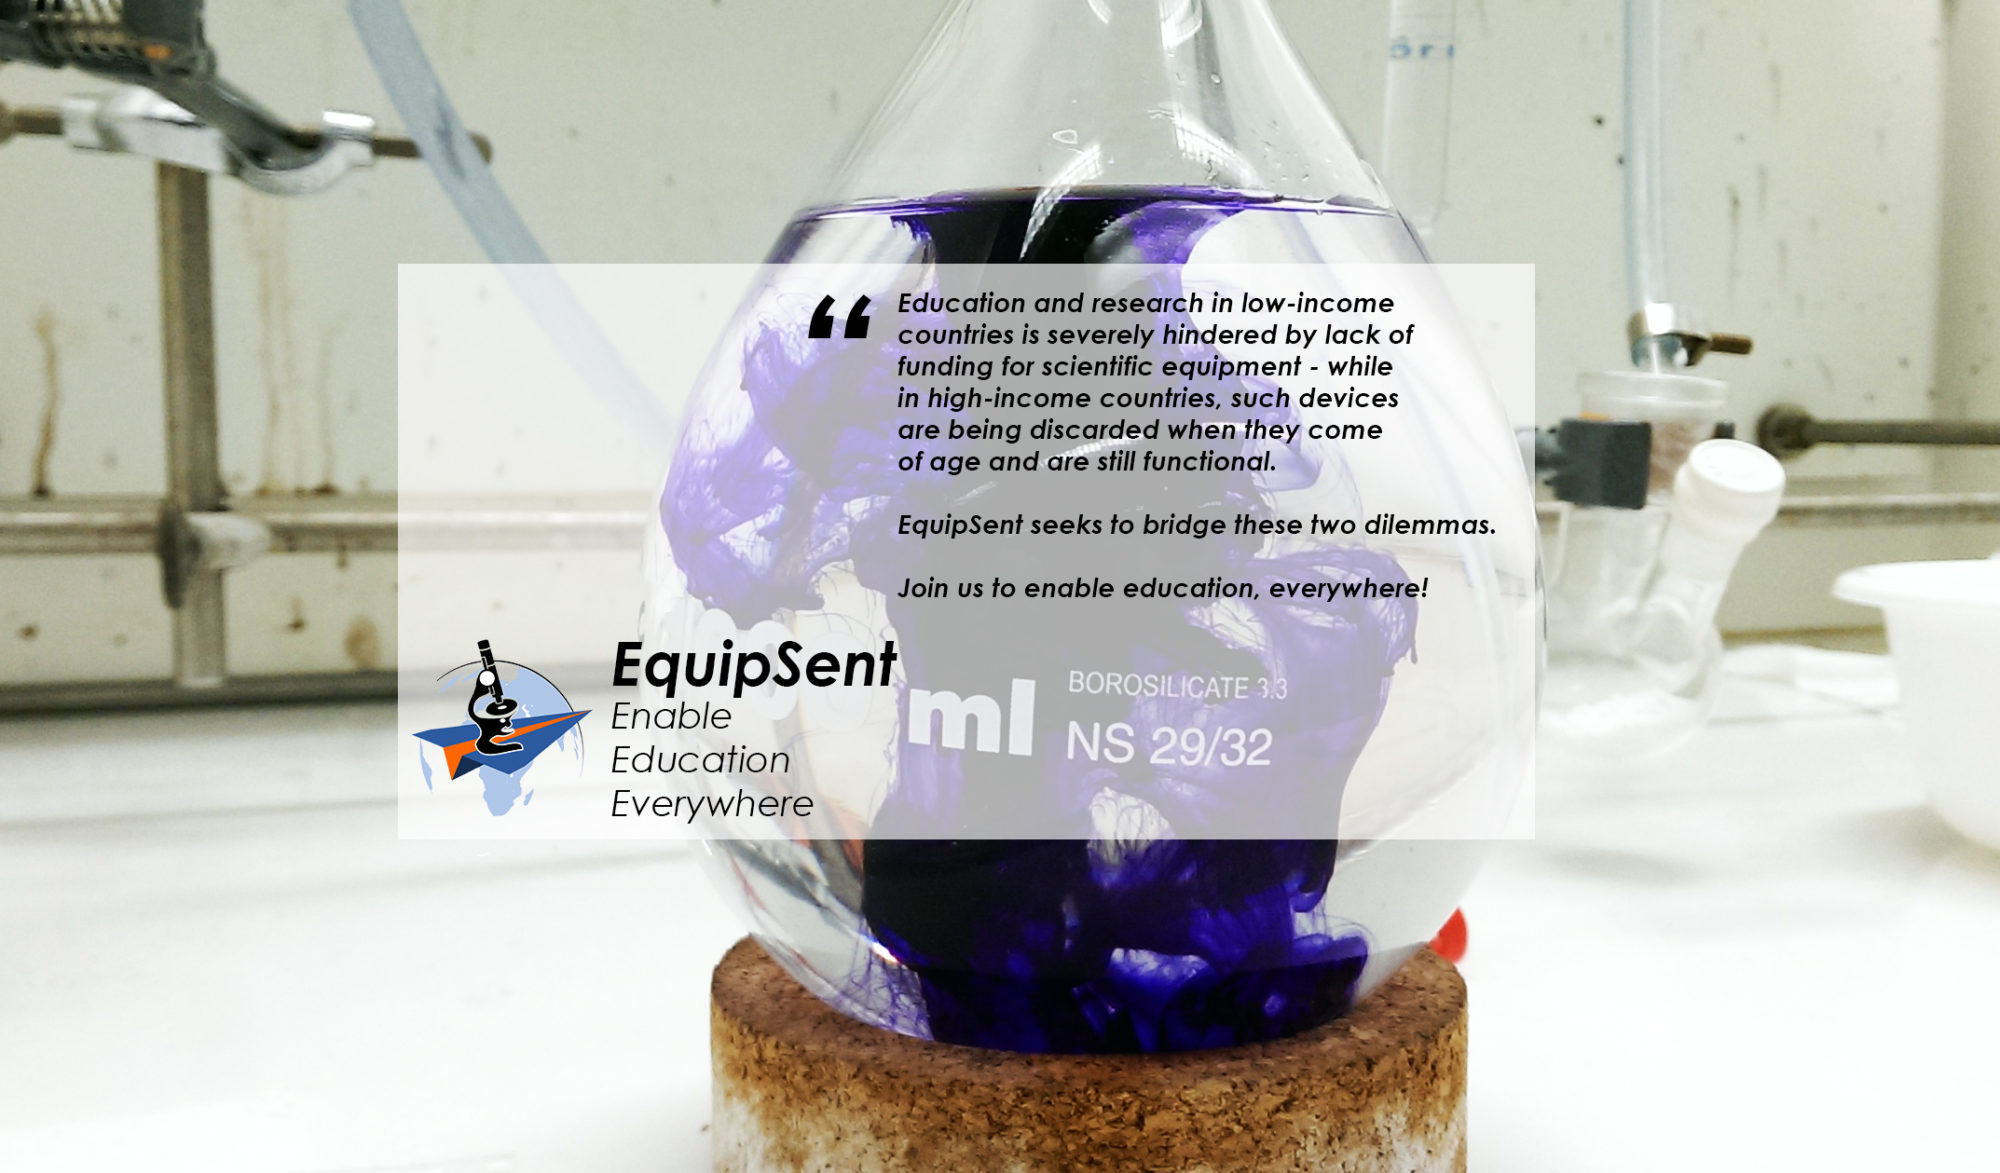 EquipSent